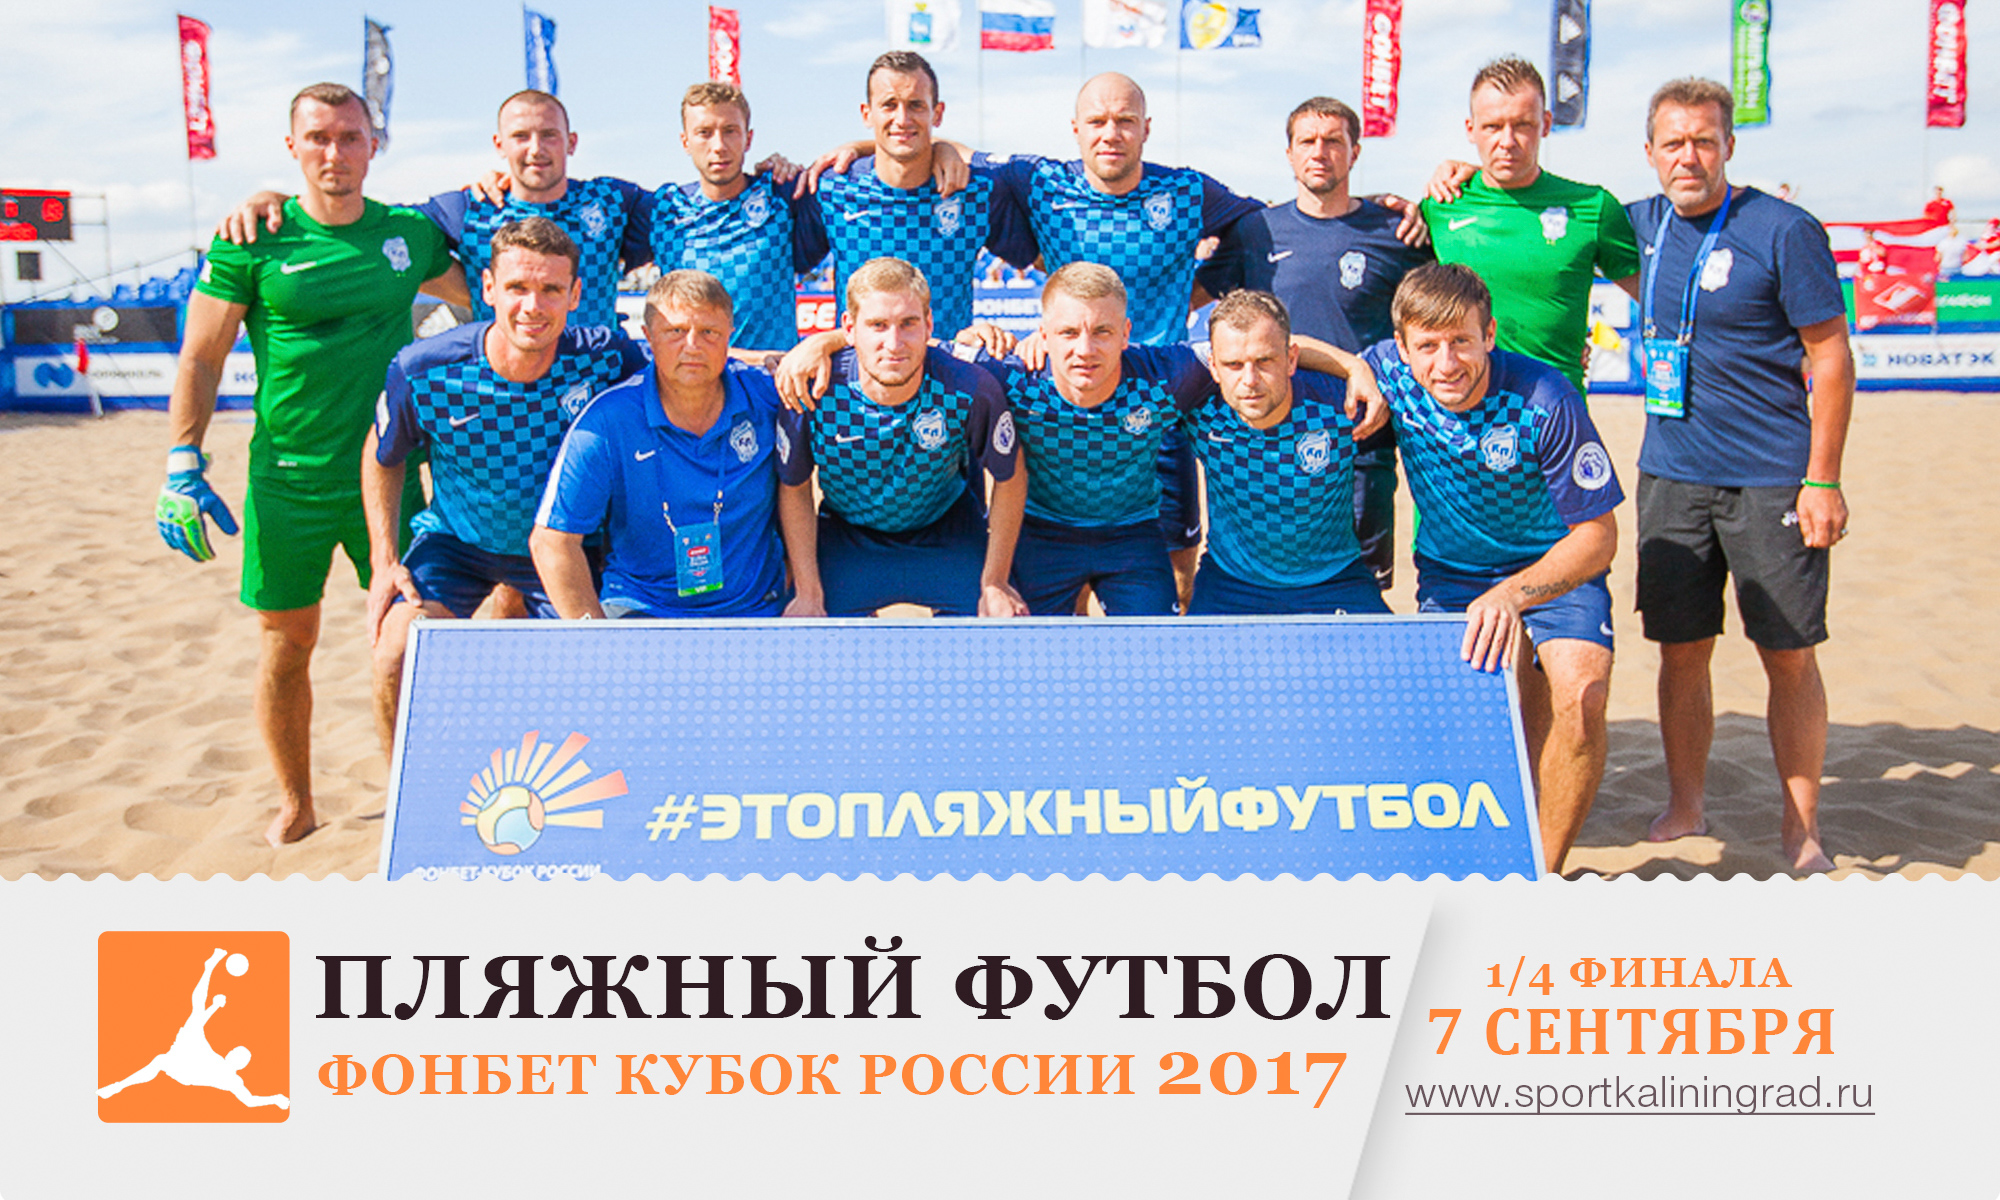 beachsoccer-kubok-rossia-2107-samara-sportkaliningrad